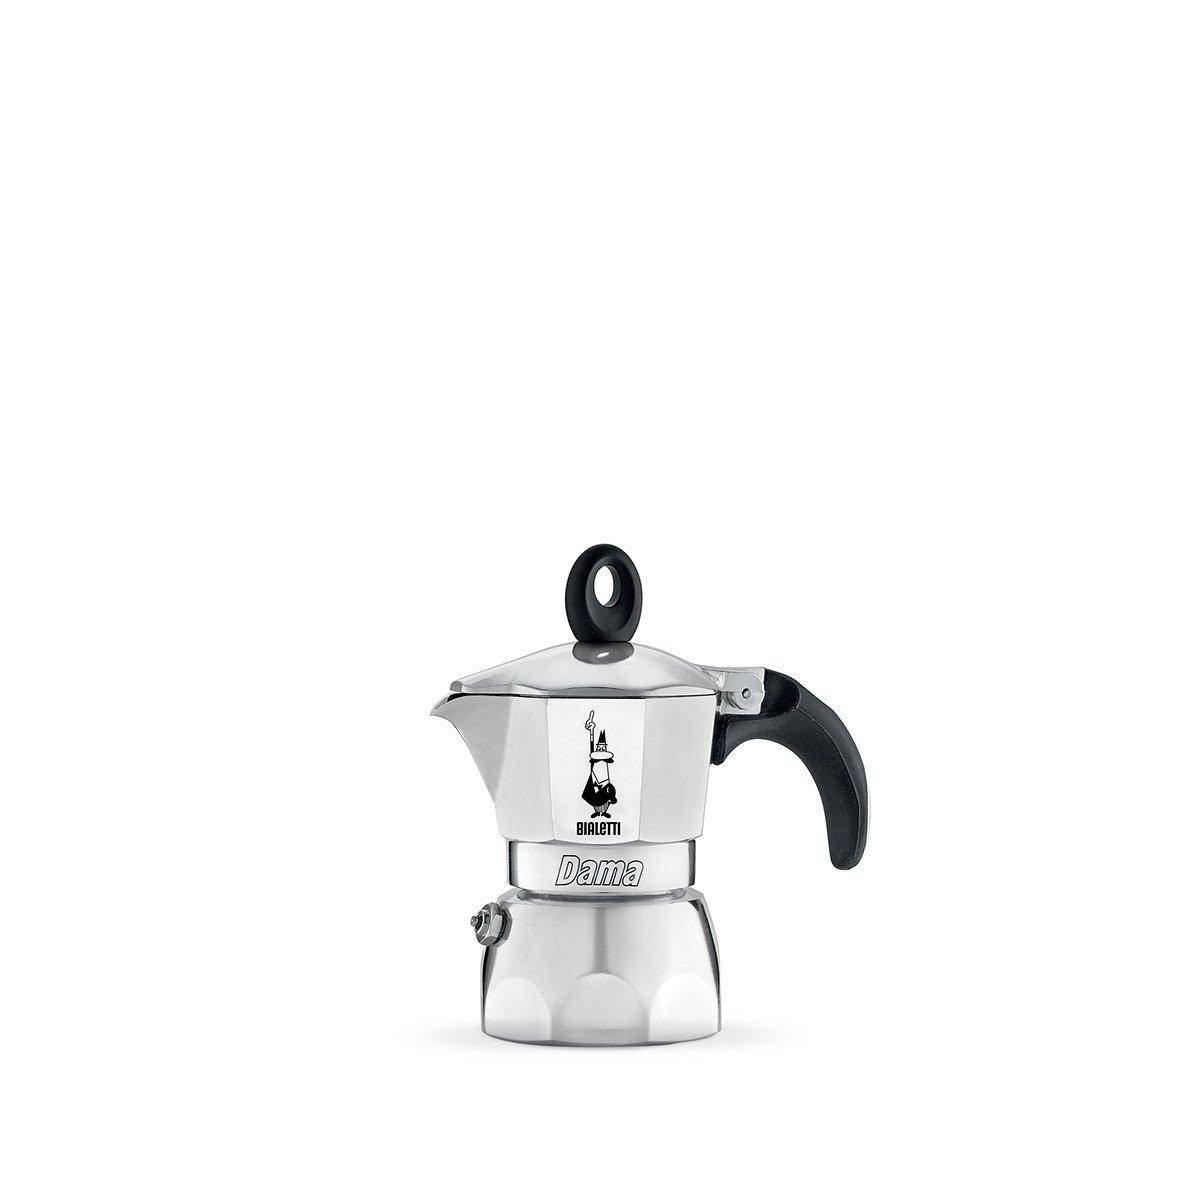 Bialetti Dama Nuova 1 Tassen Espressokocher 2151